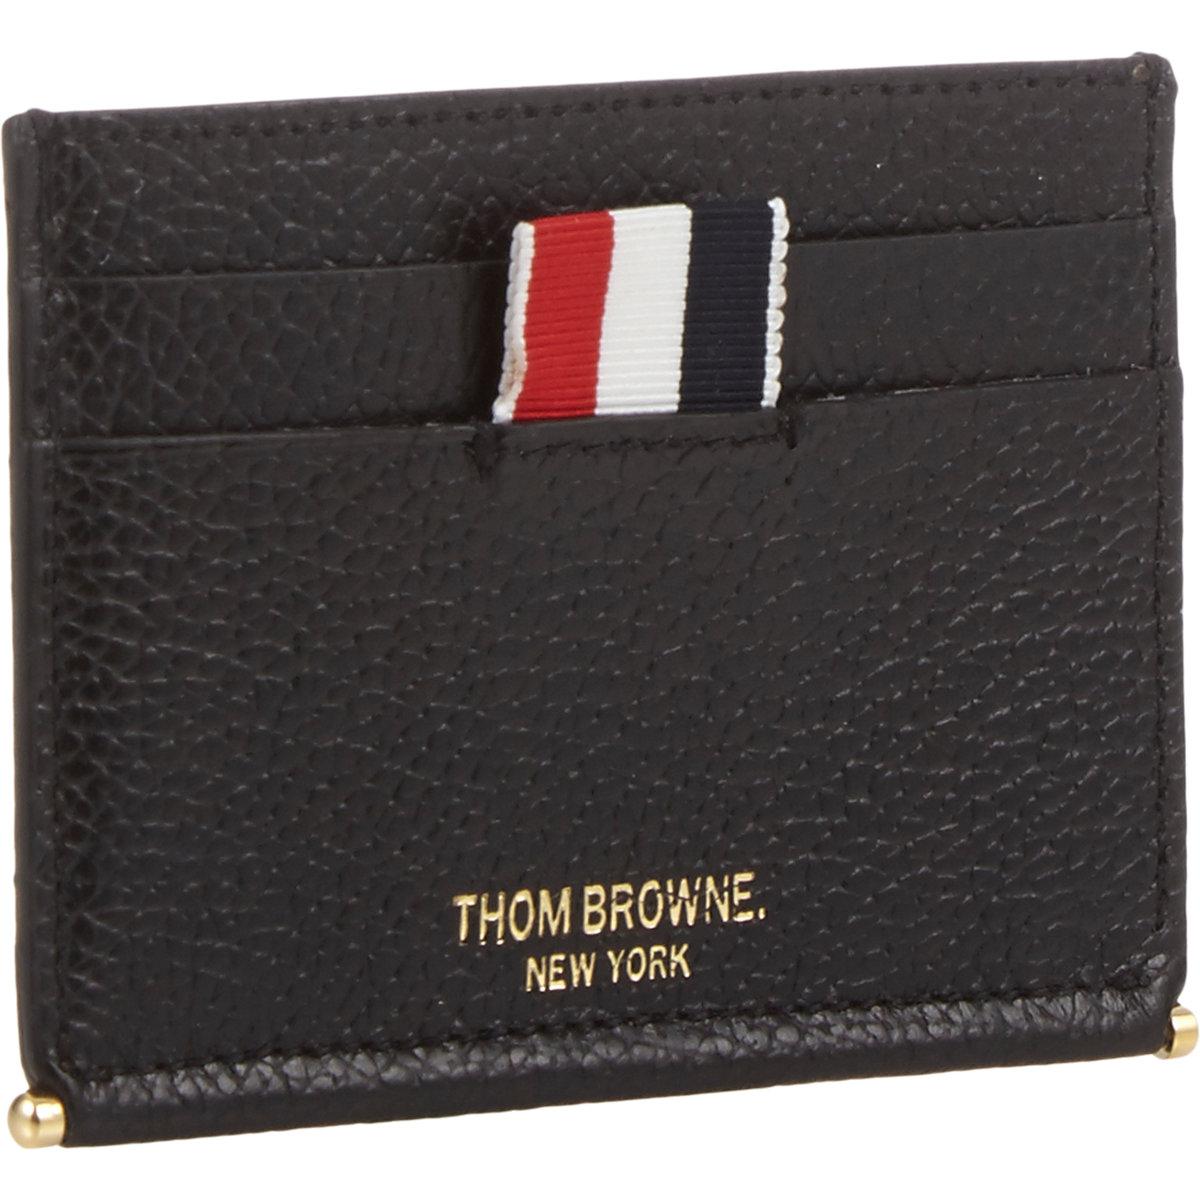 3503b81a32 Thom Browne Credit Card Holder in Black for Men - Lyst